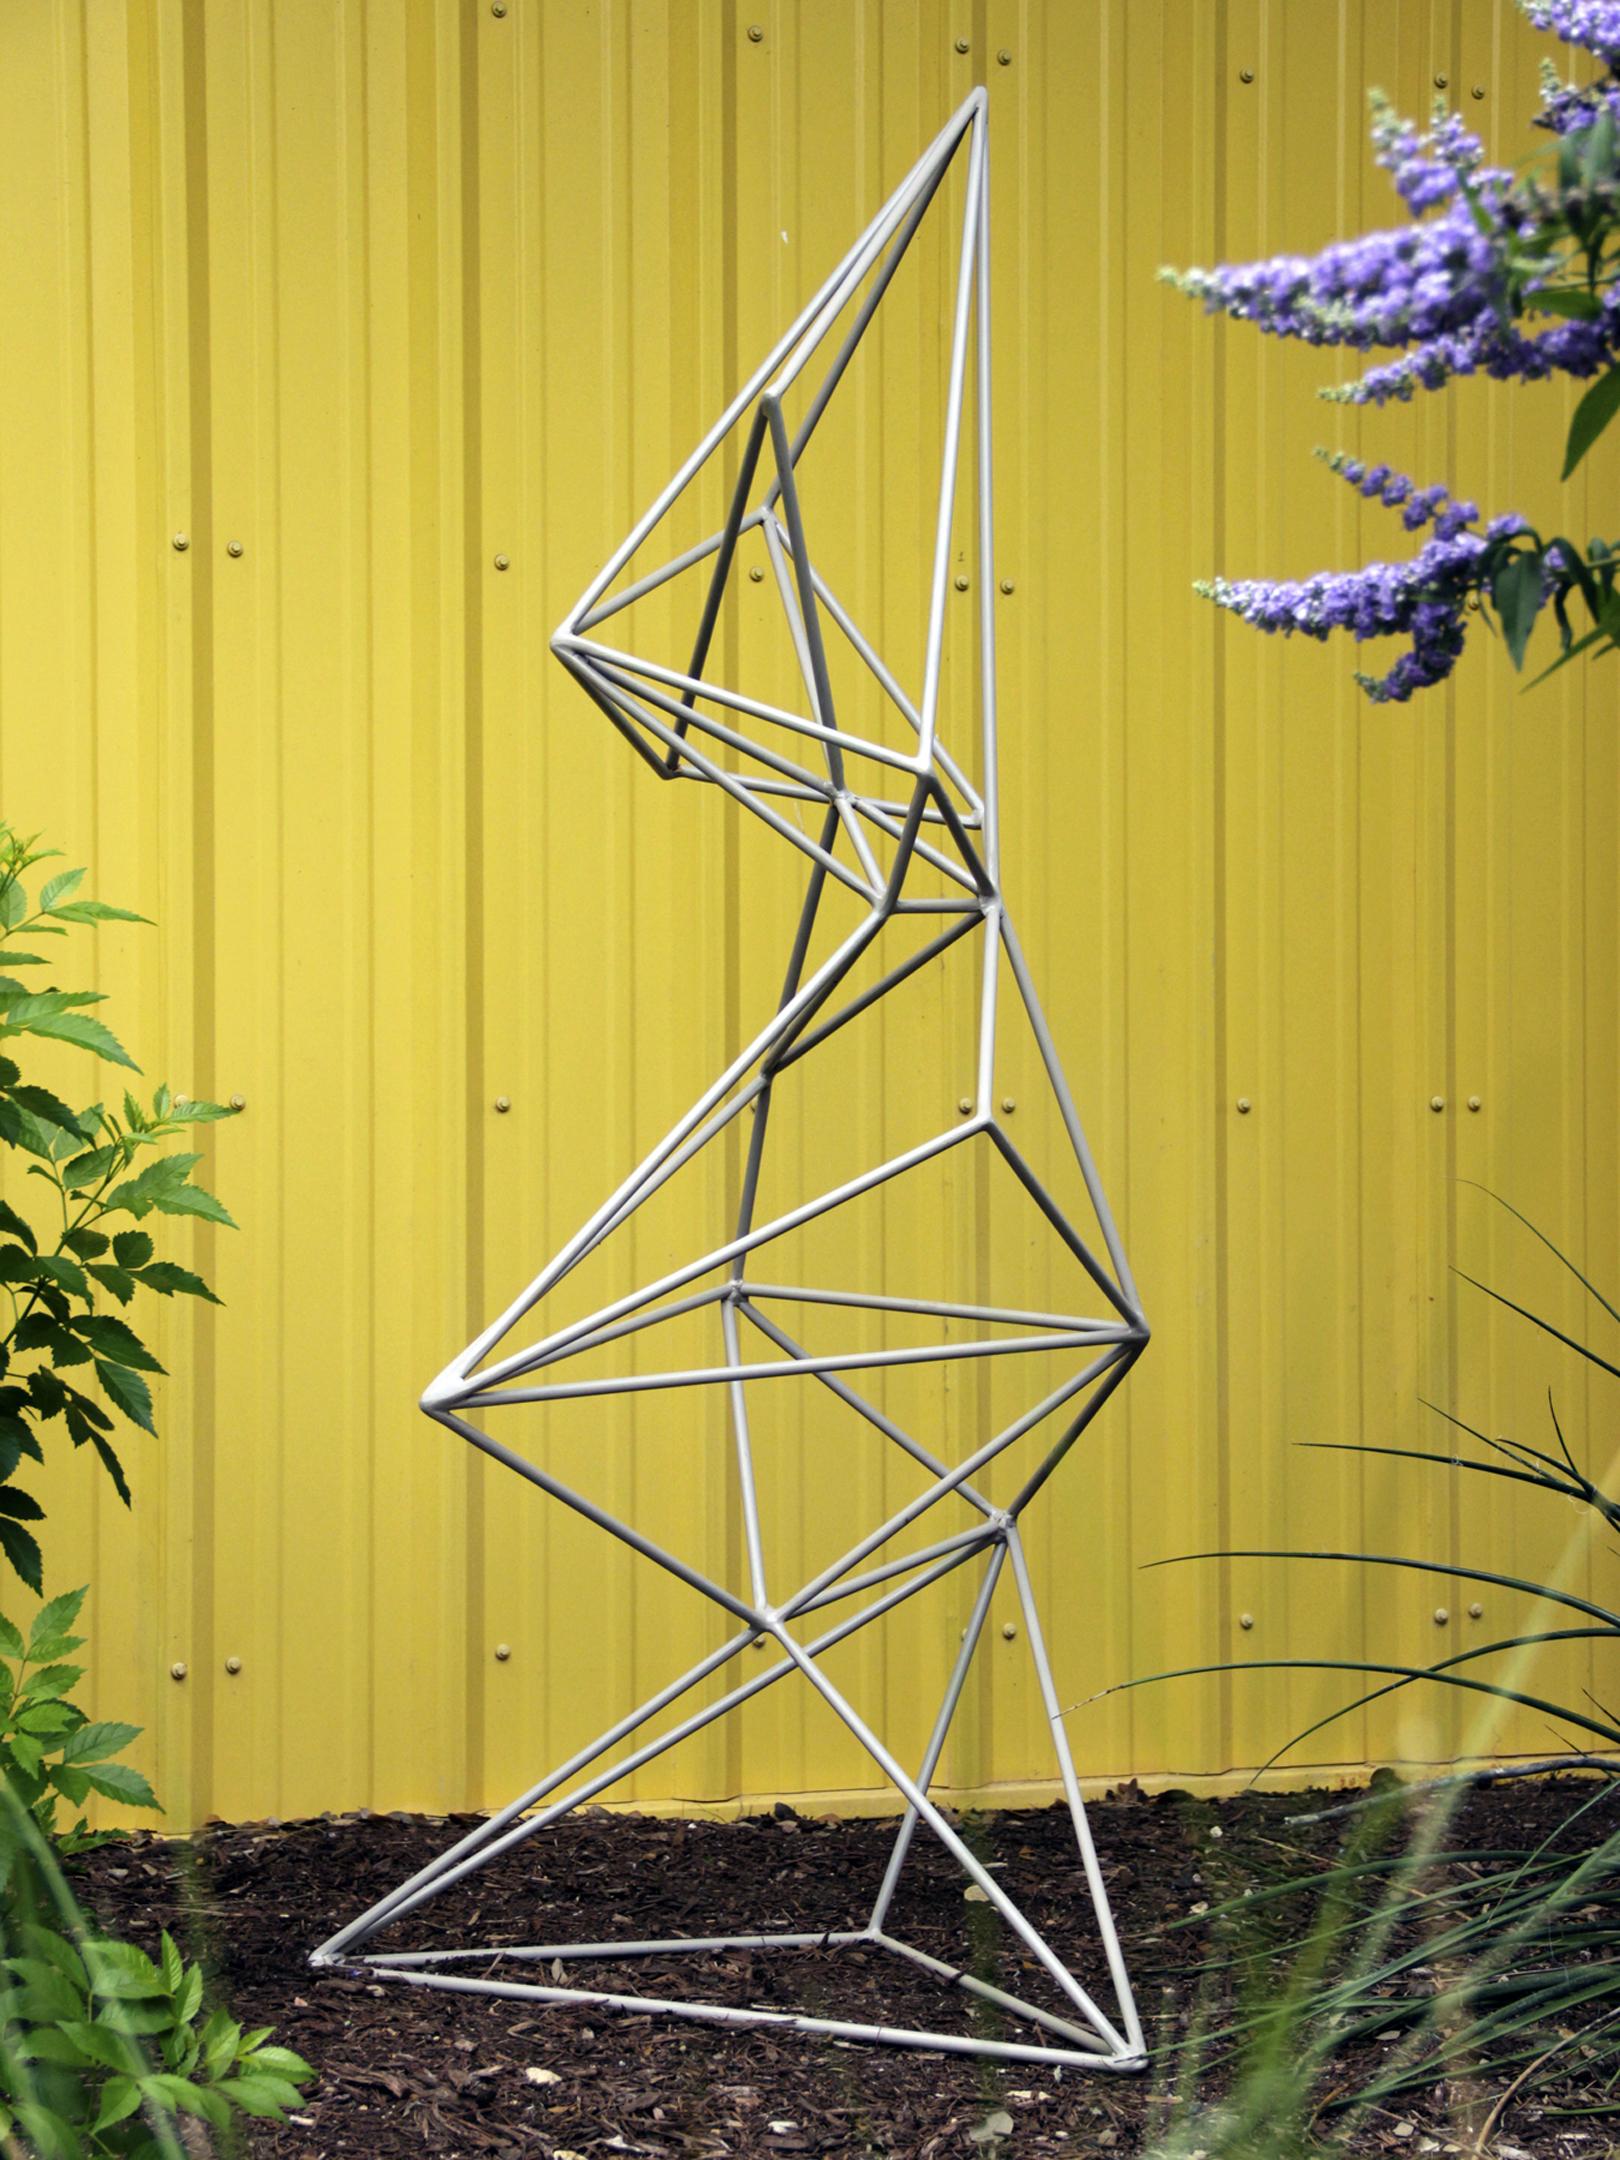 Skeletal Polyhedron #9